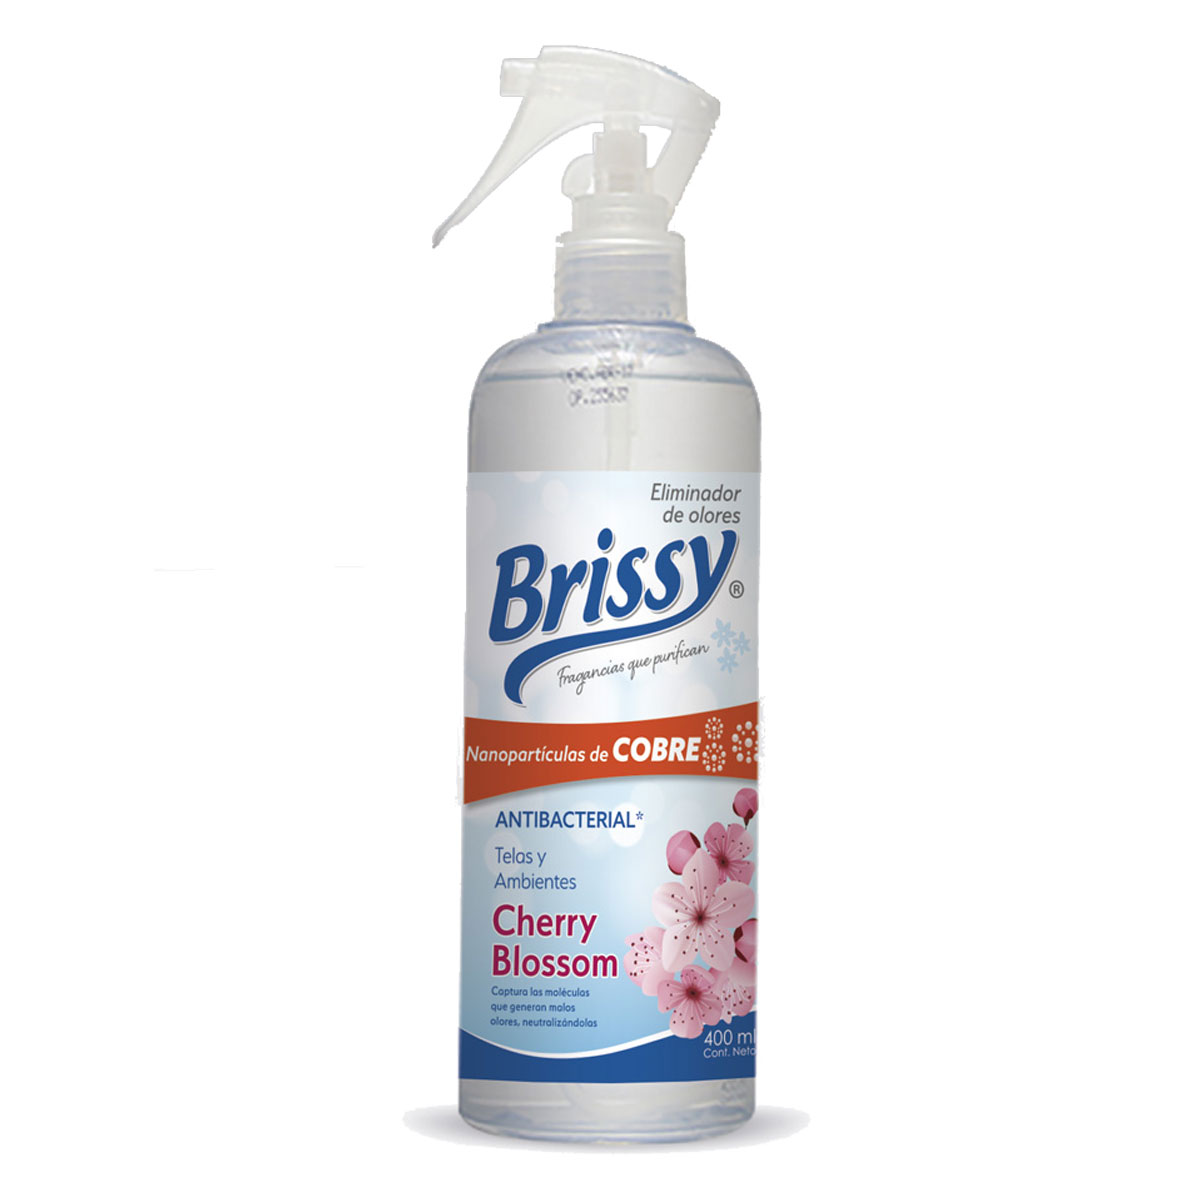 Spray eliminador de olores Antibacterial Cherry Blossom